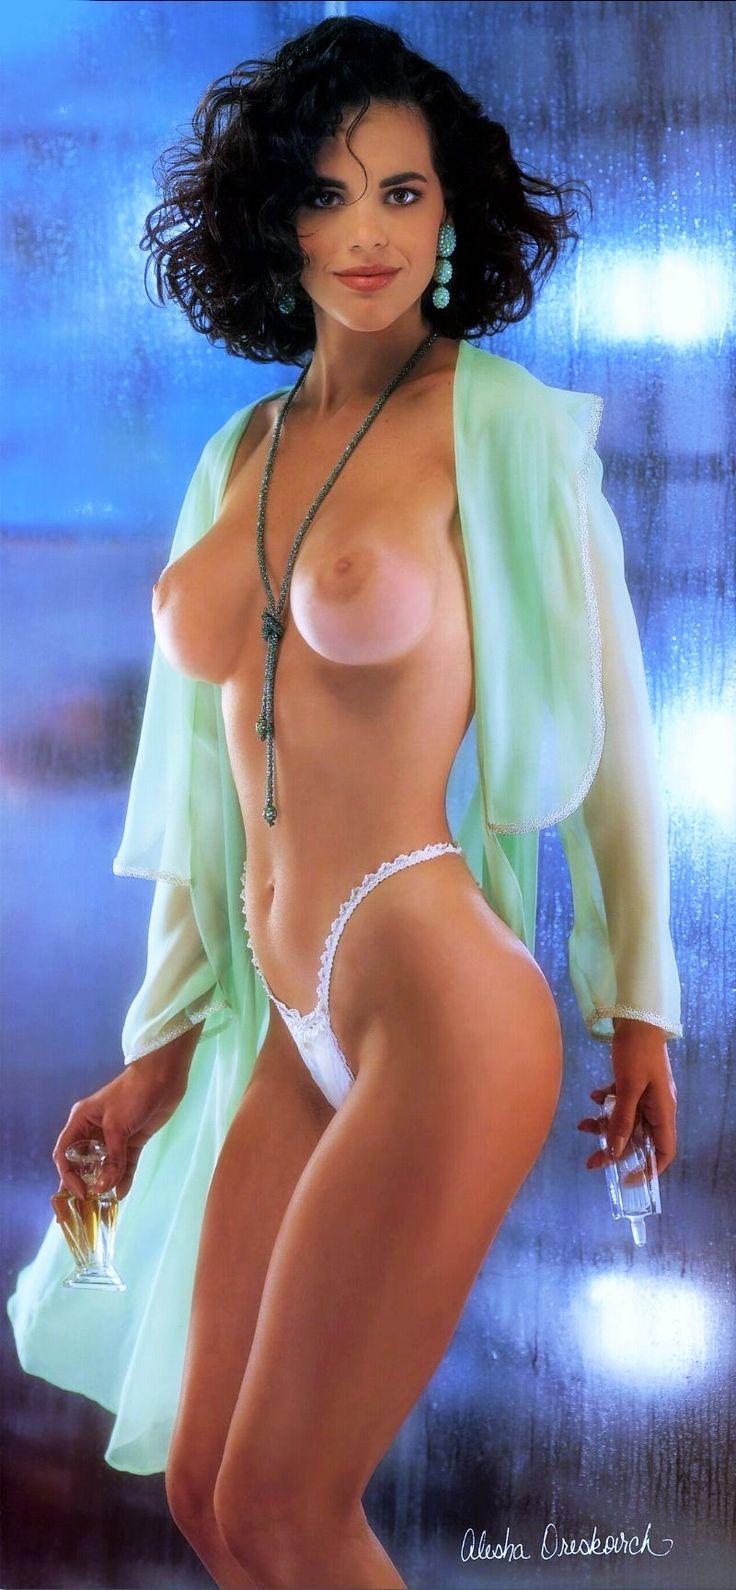 Alesha marie oreskovich